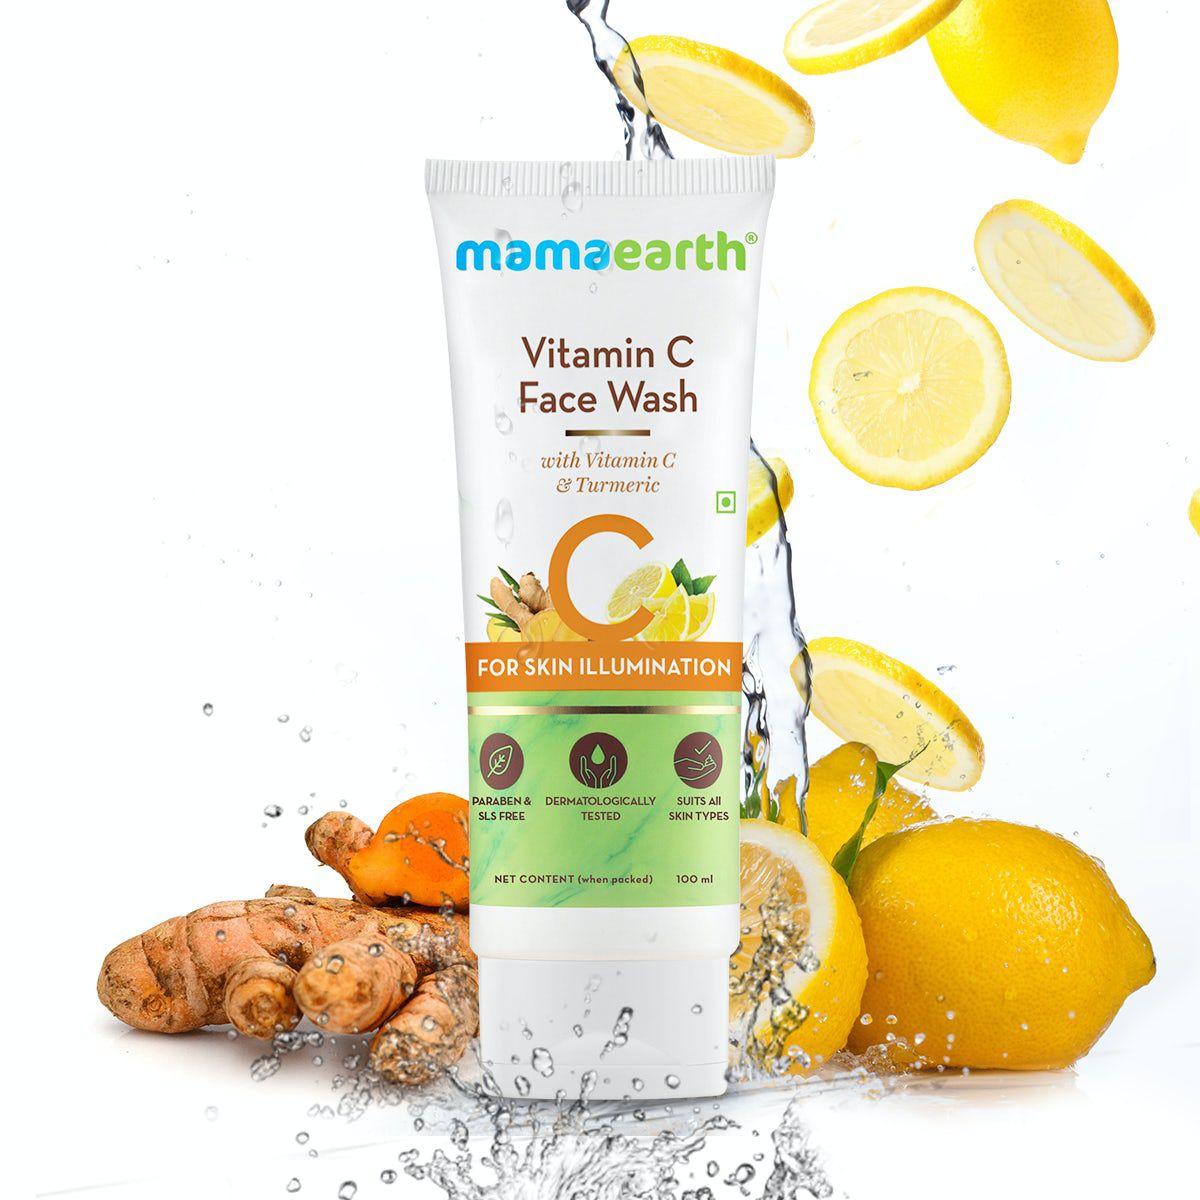 Vitamin C Face Wash with Vitamin C and Turmeric for Skin Illumination – 100ml